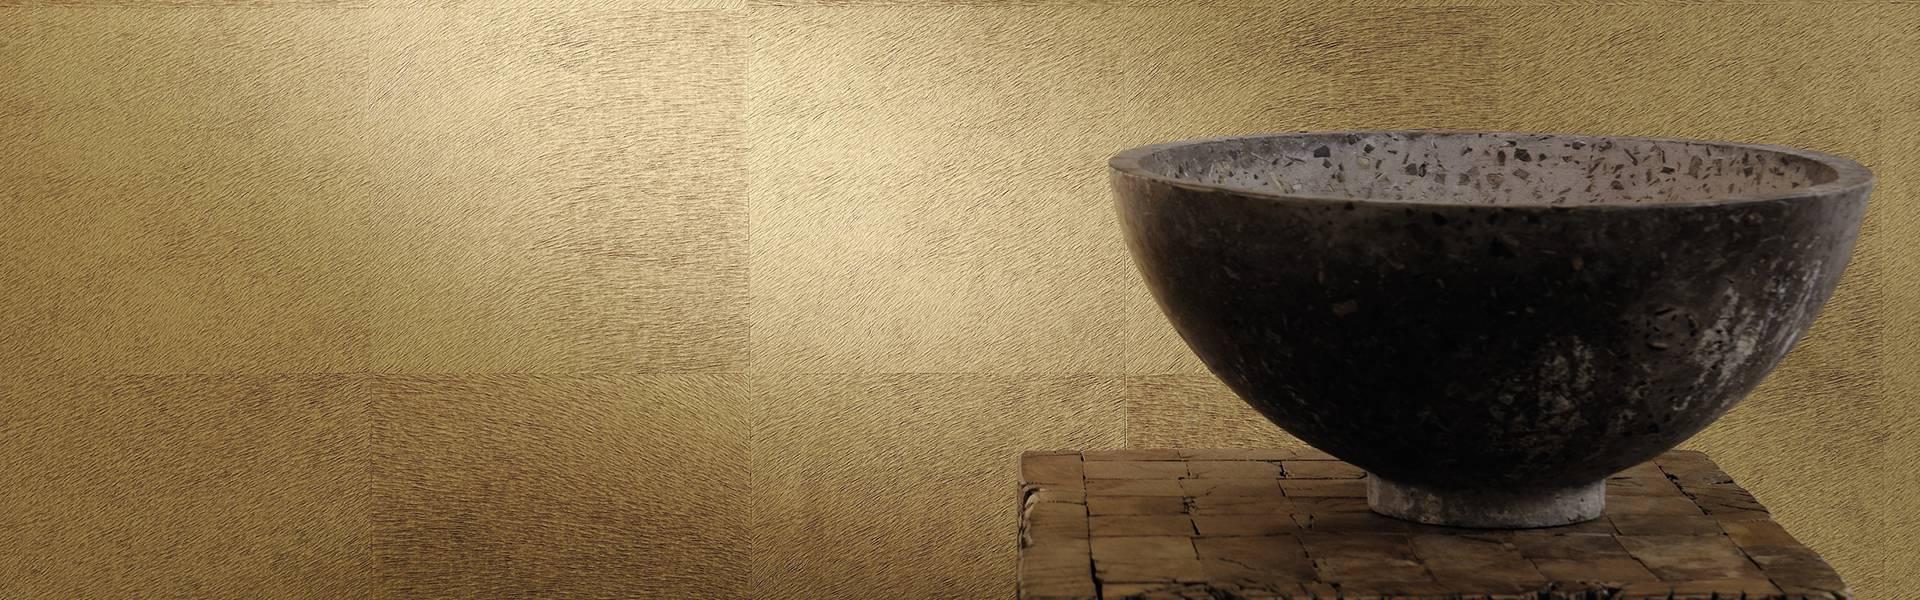 claire-dondelair-muurdecoratie